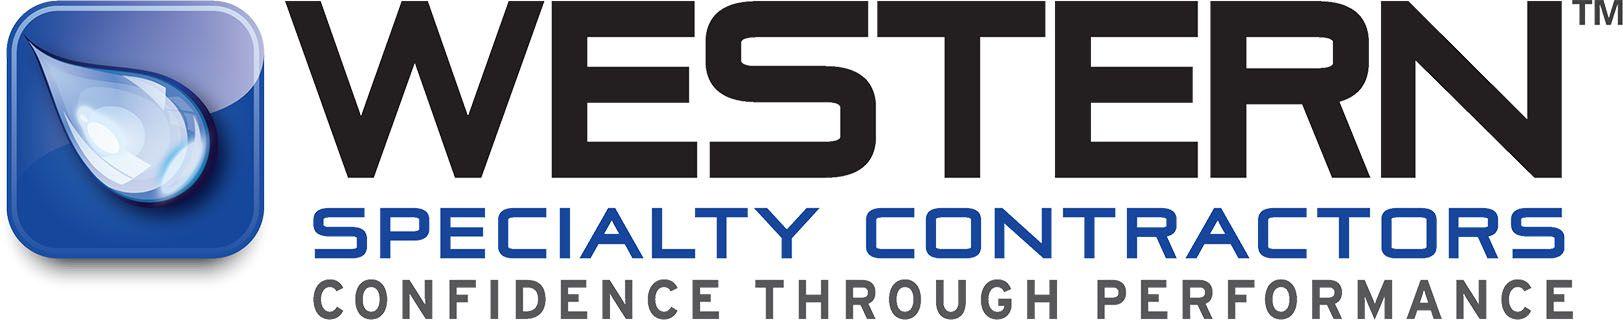 Western Specialist Contractors